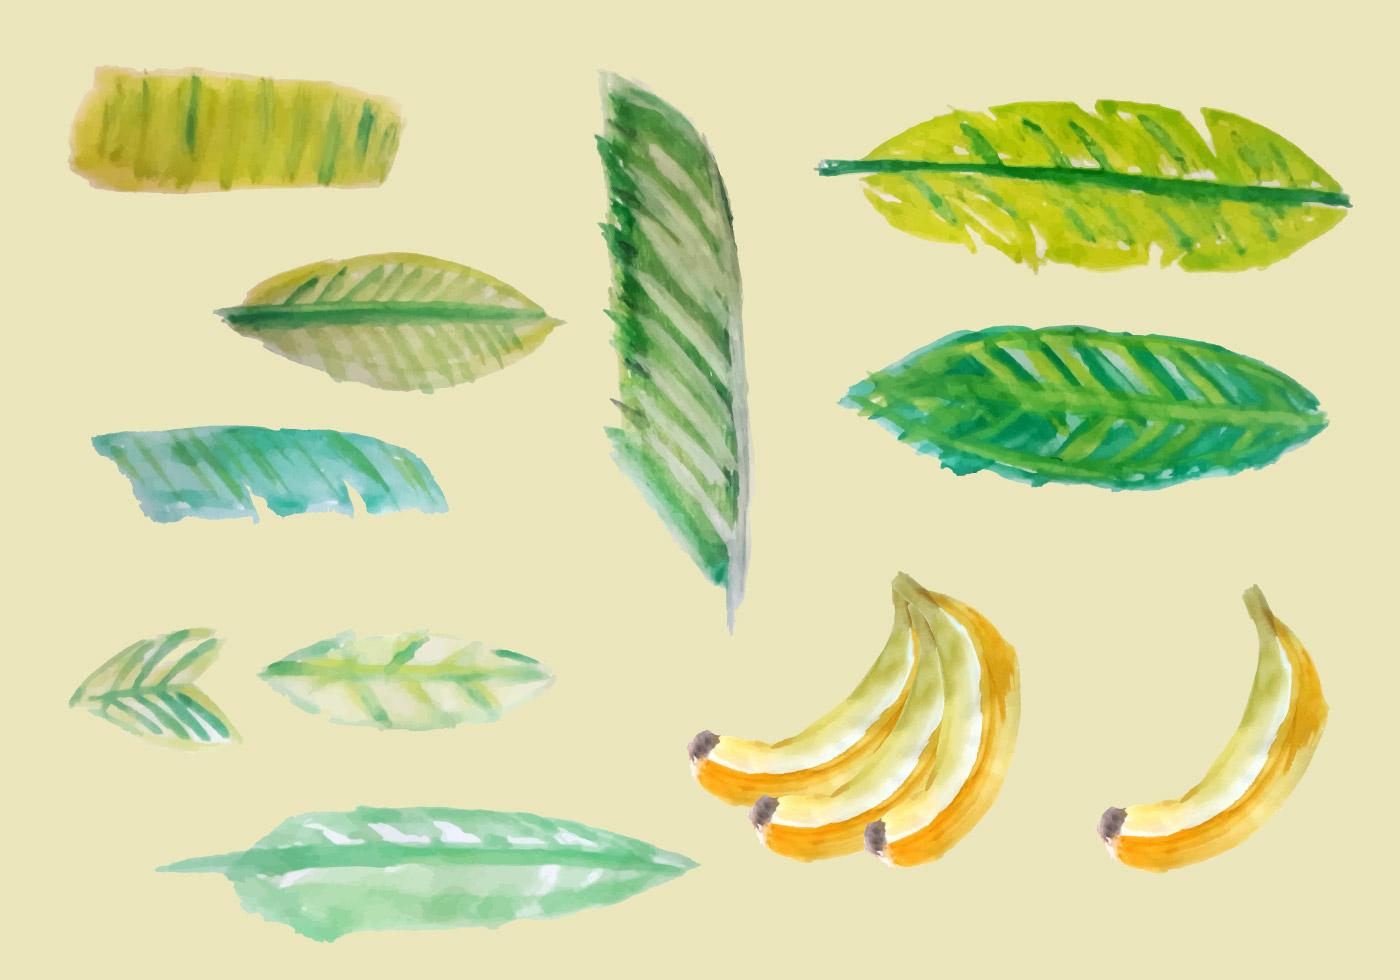 banana tree leaves vector - photo #2